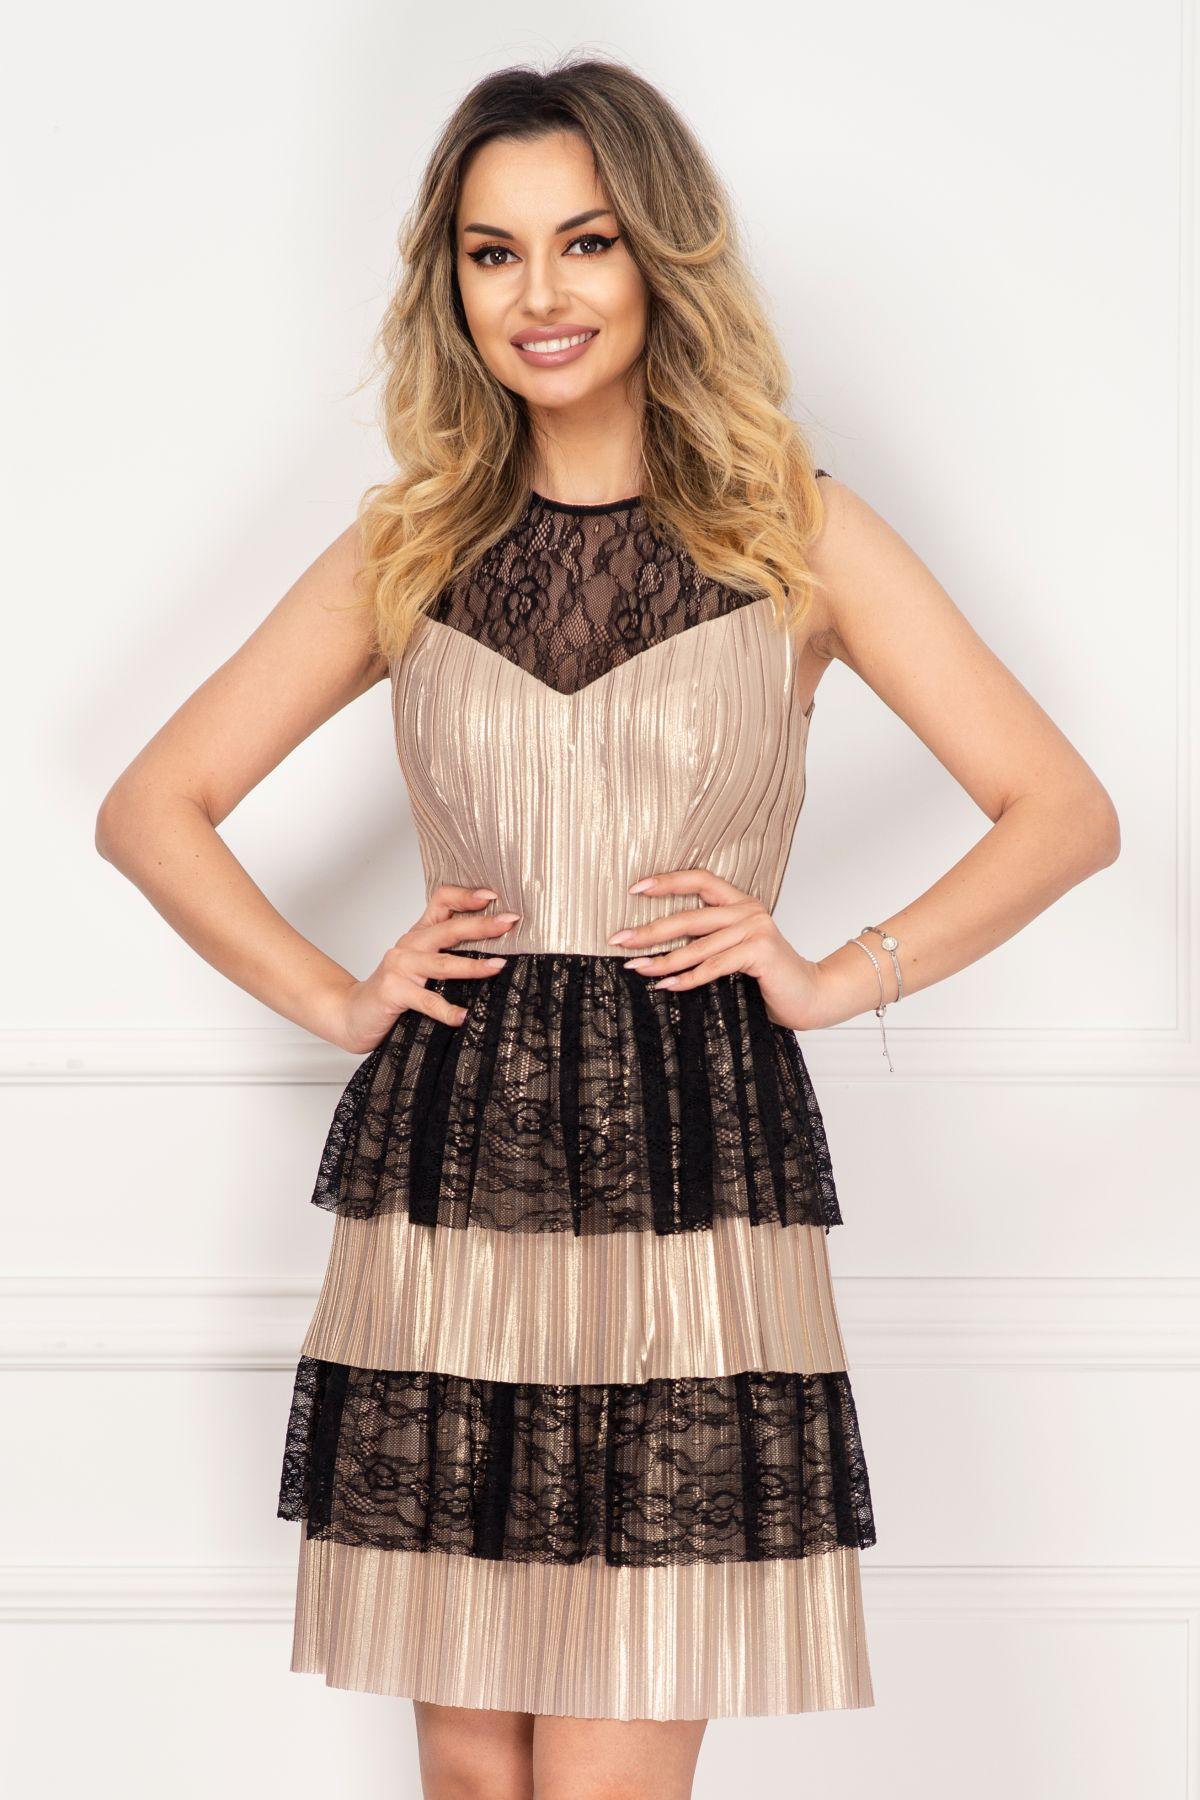 Rochie Xara eleganta aurie din jerse plisat cu volane din dantela neagra